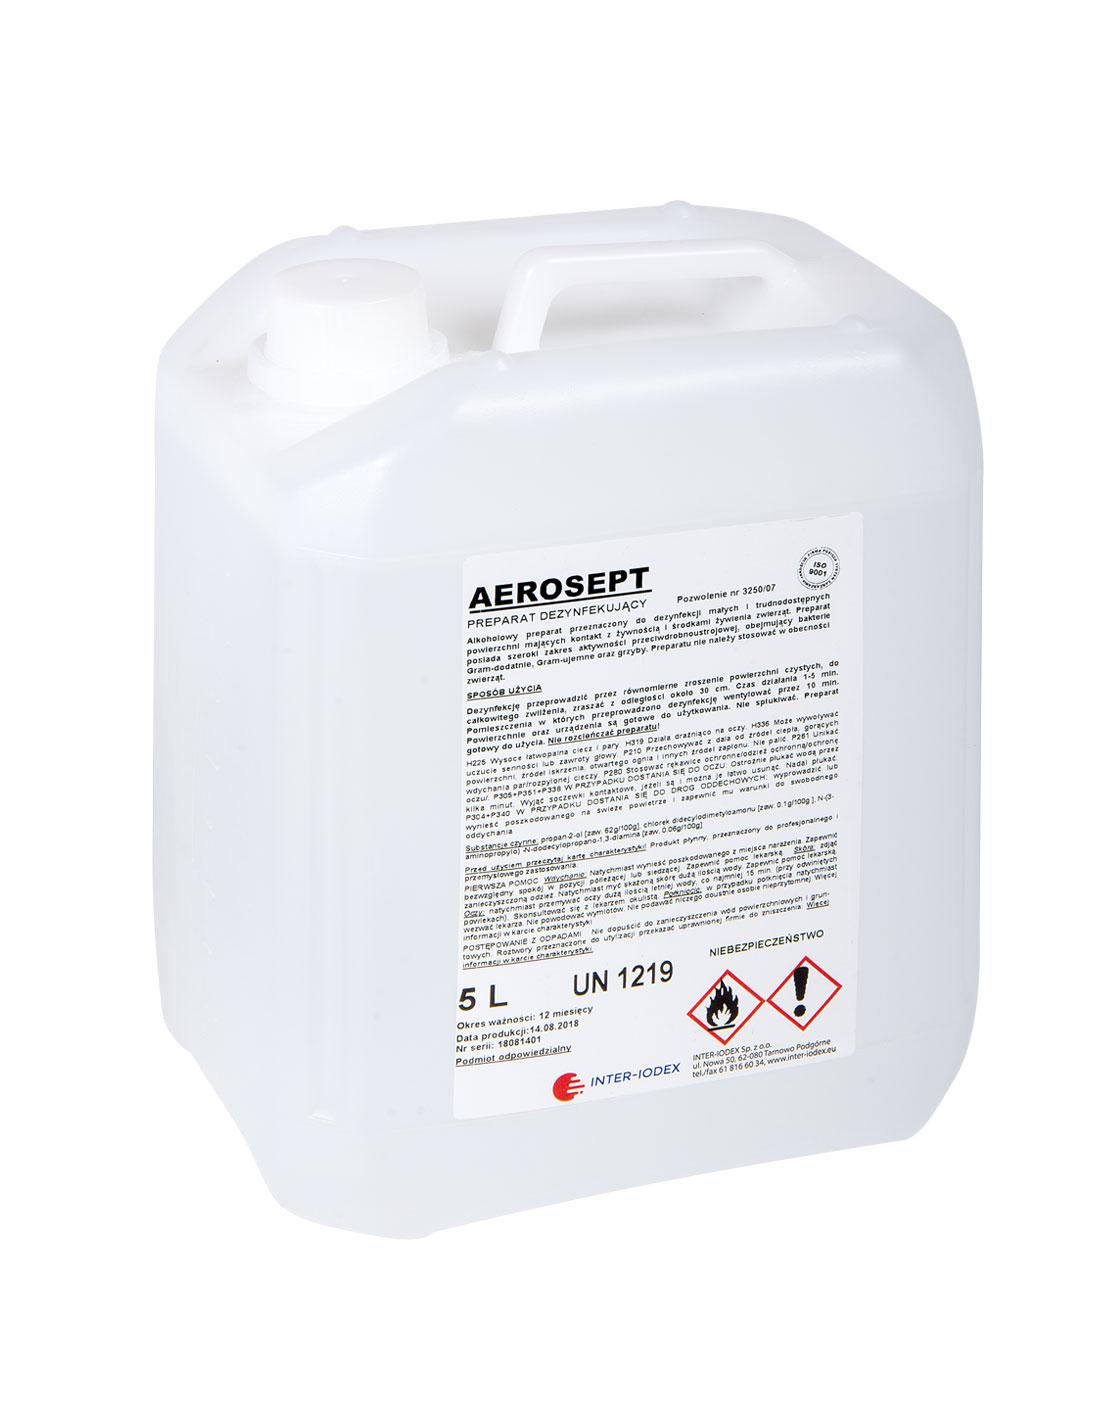 AEROSEPT 5 L